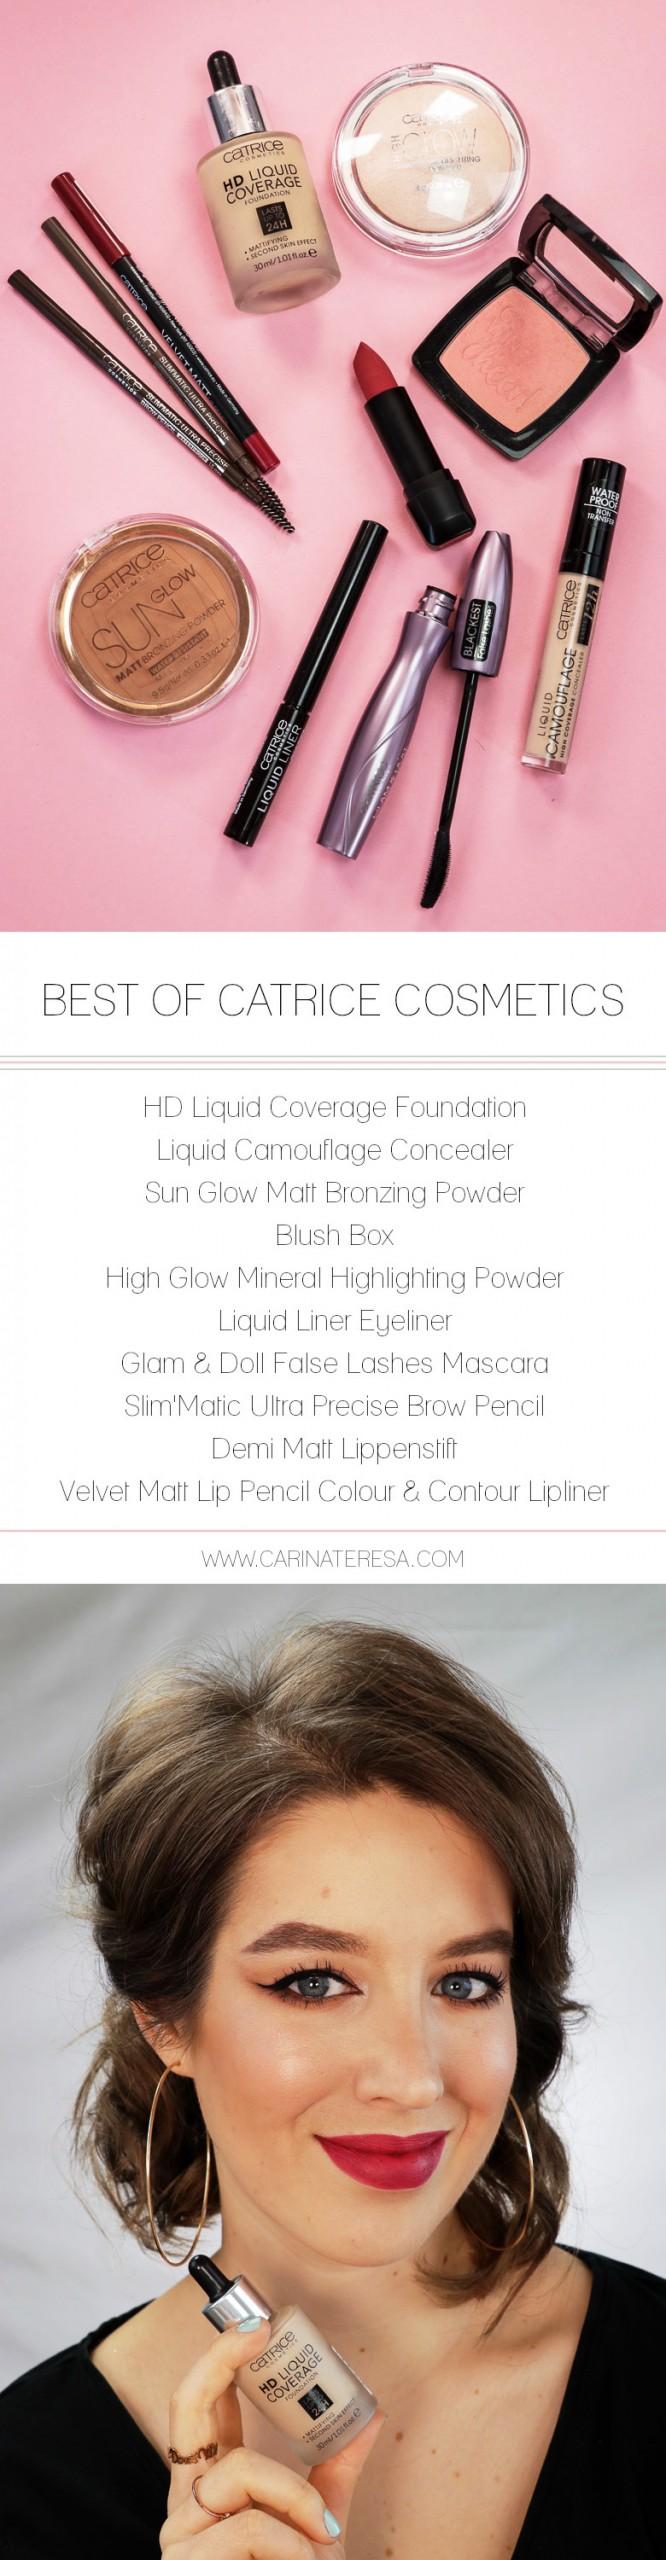 Catrice Cosmetics Favoriten